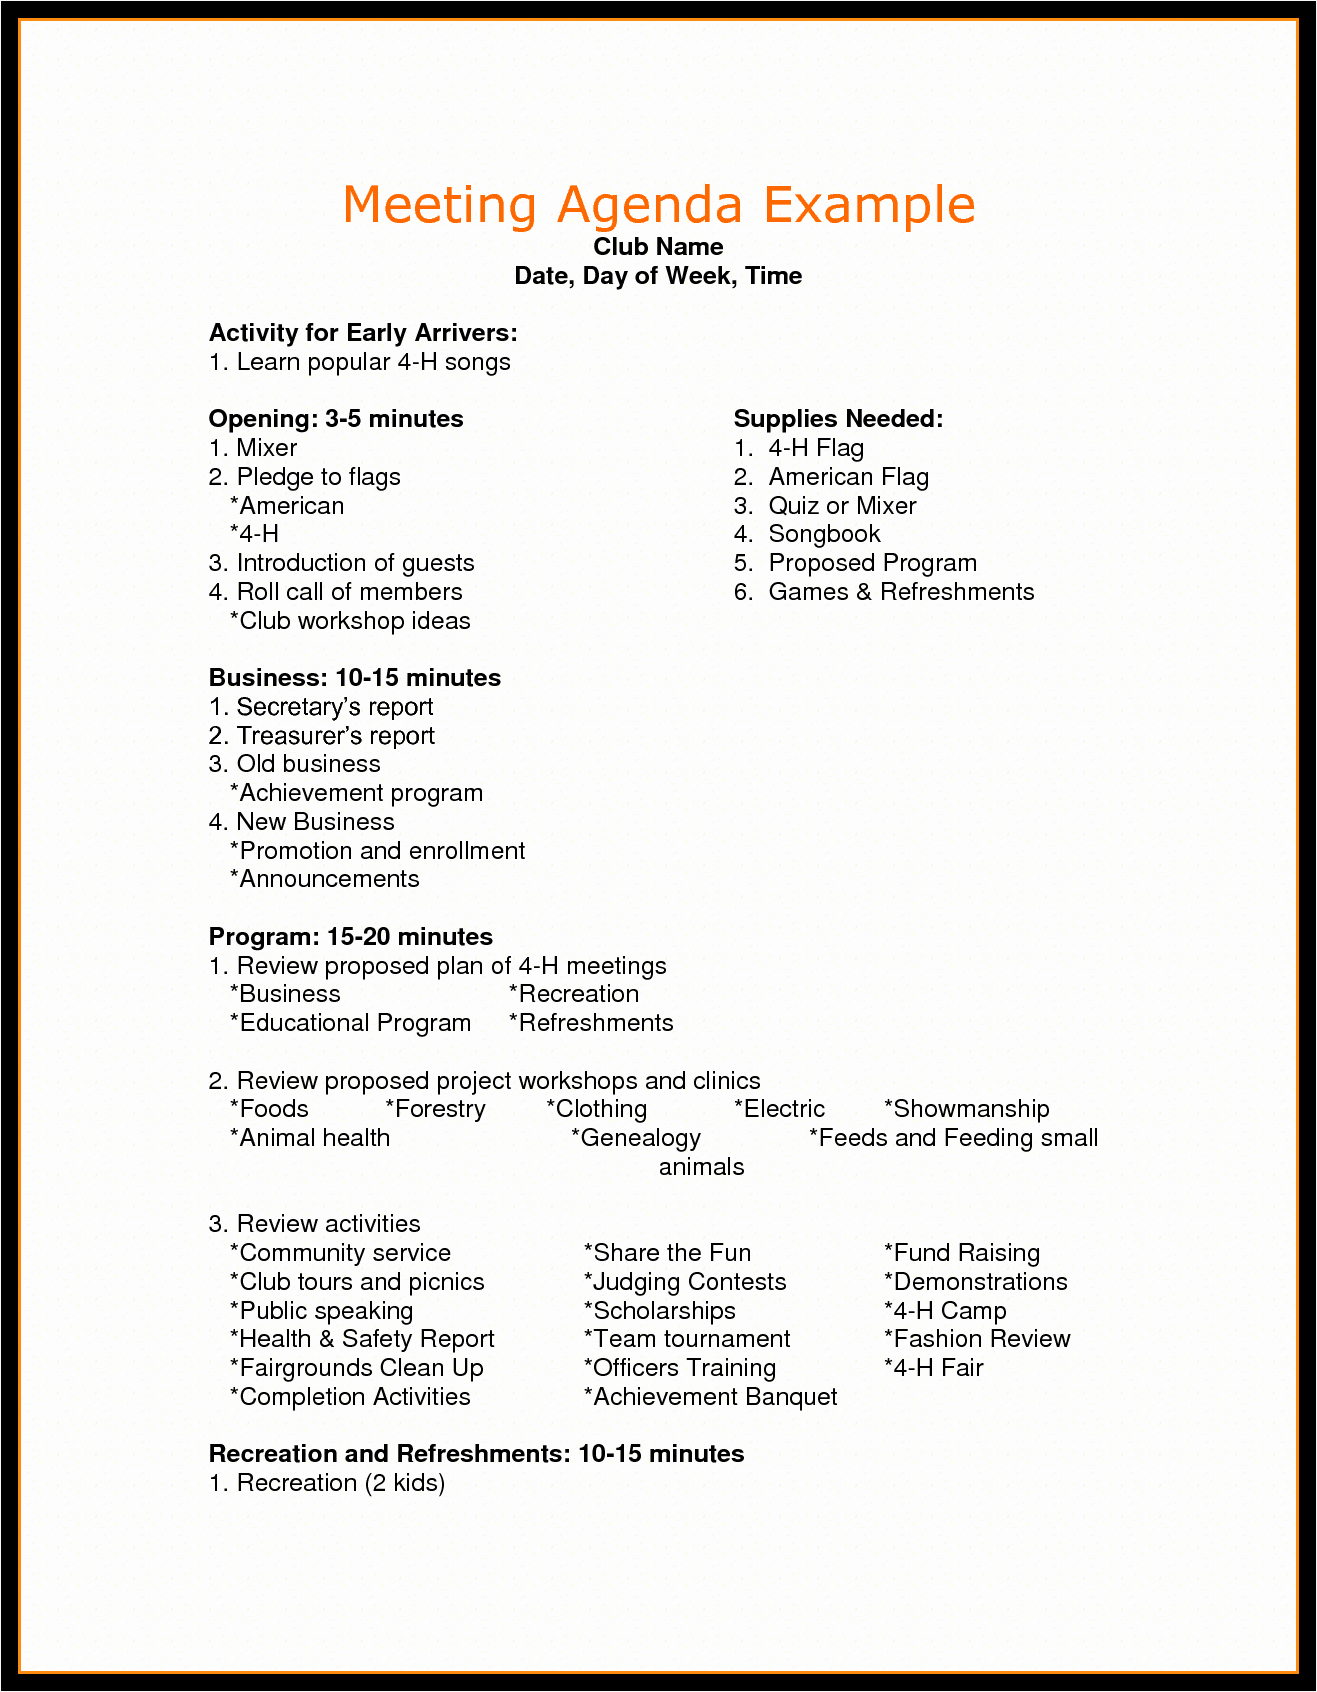 Agenda format for A Meeting Elegant Agenda for Meeting Example Mughals